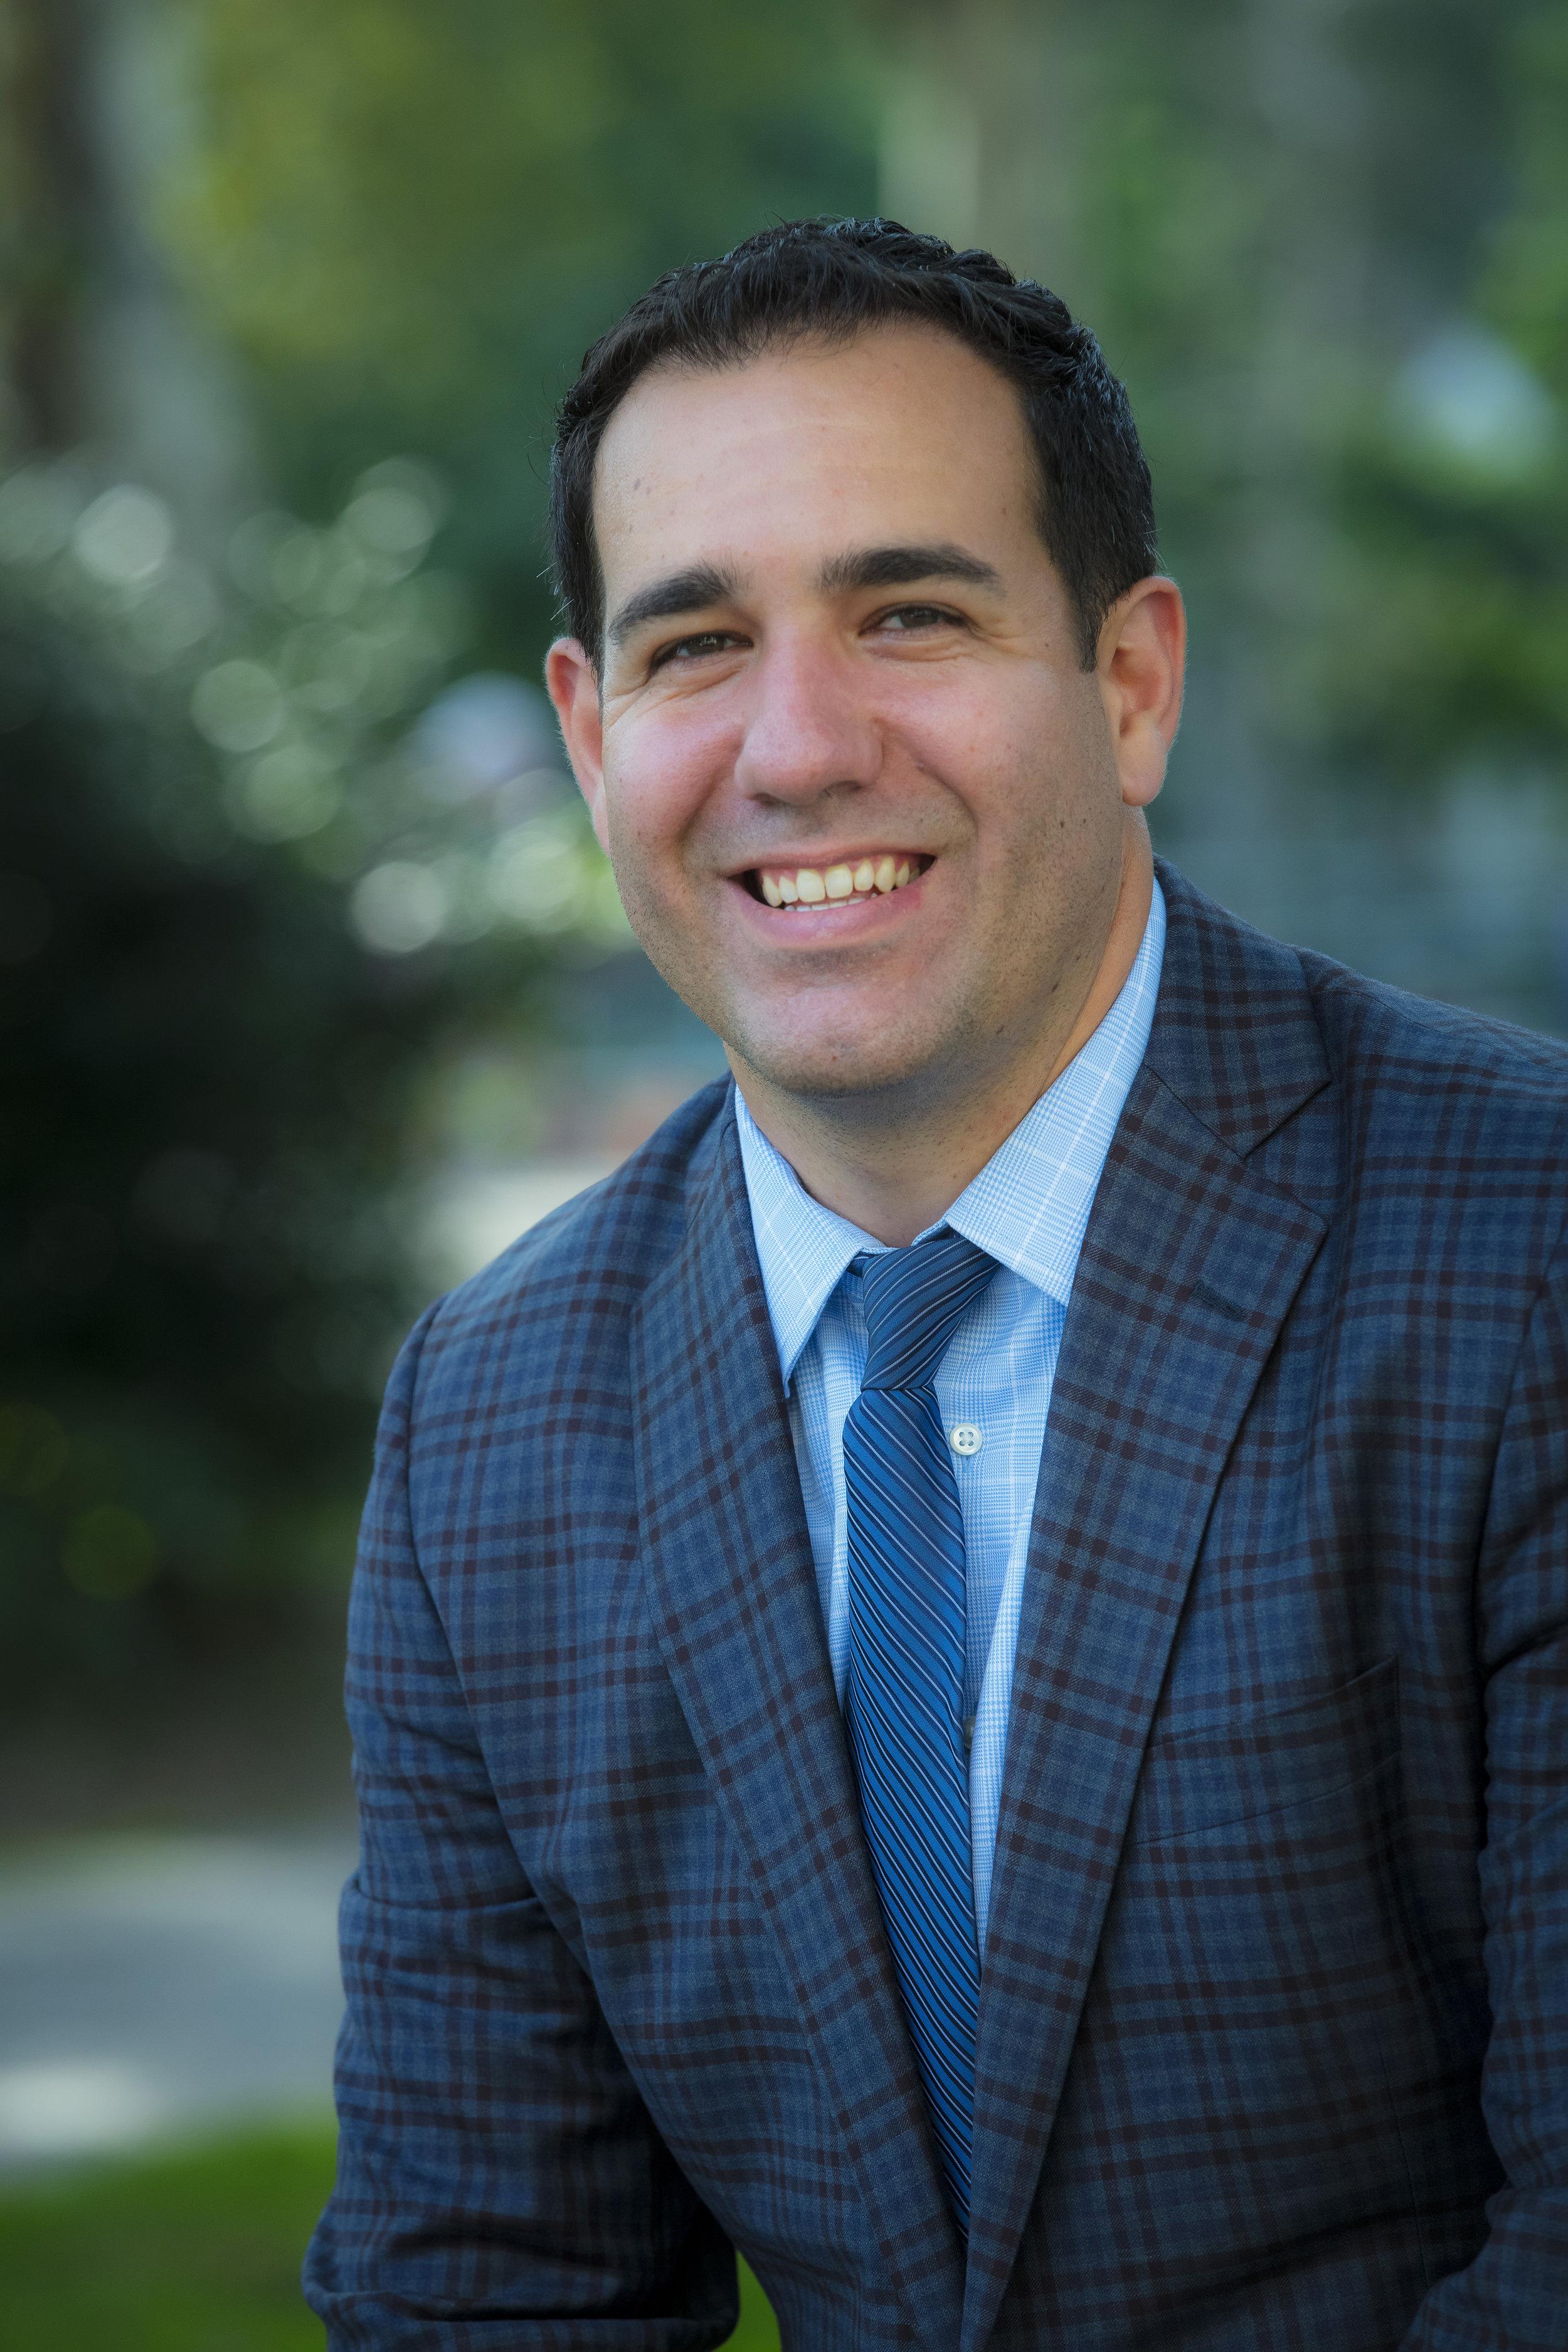 Andrew Impastato for Hoboken City Council